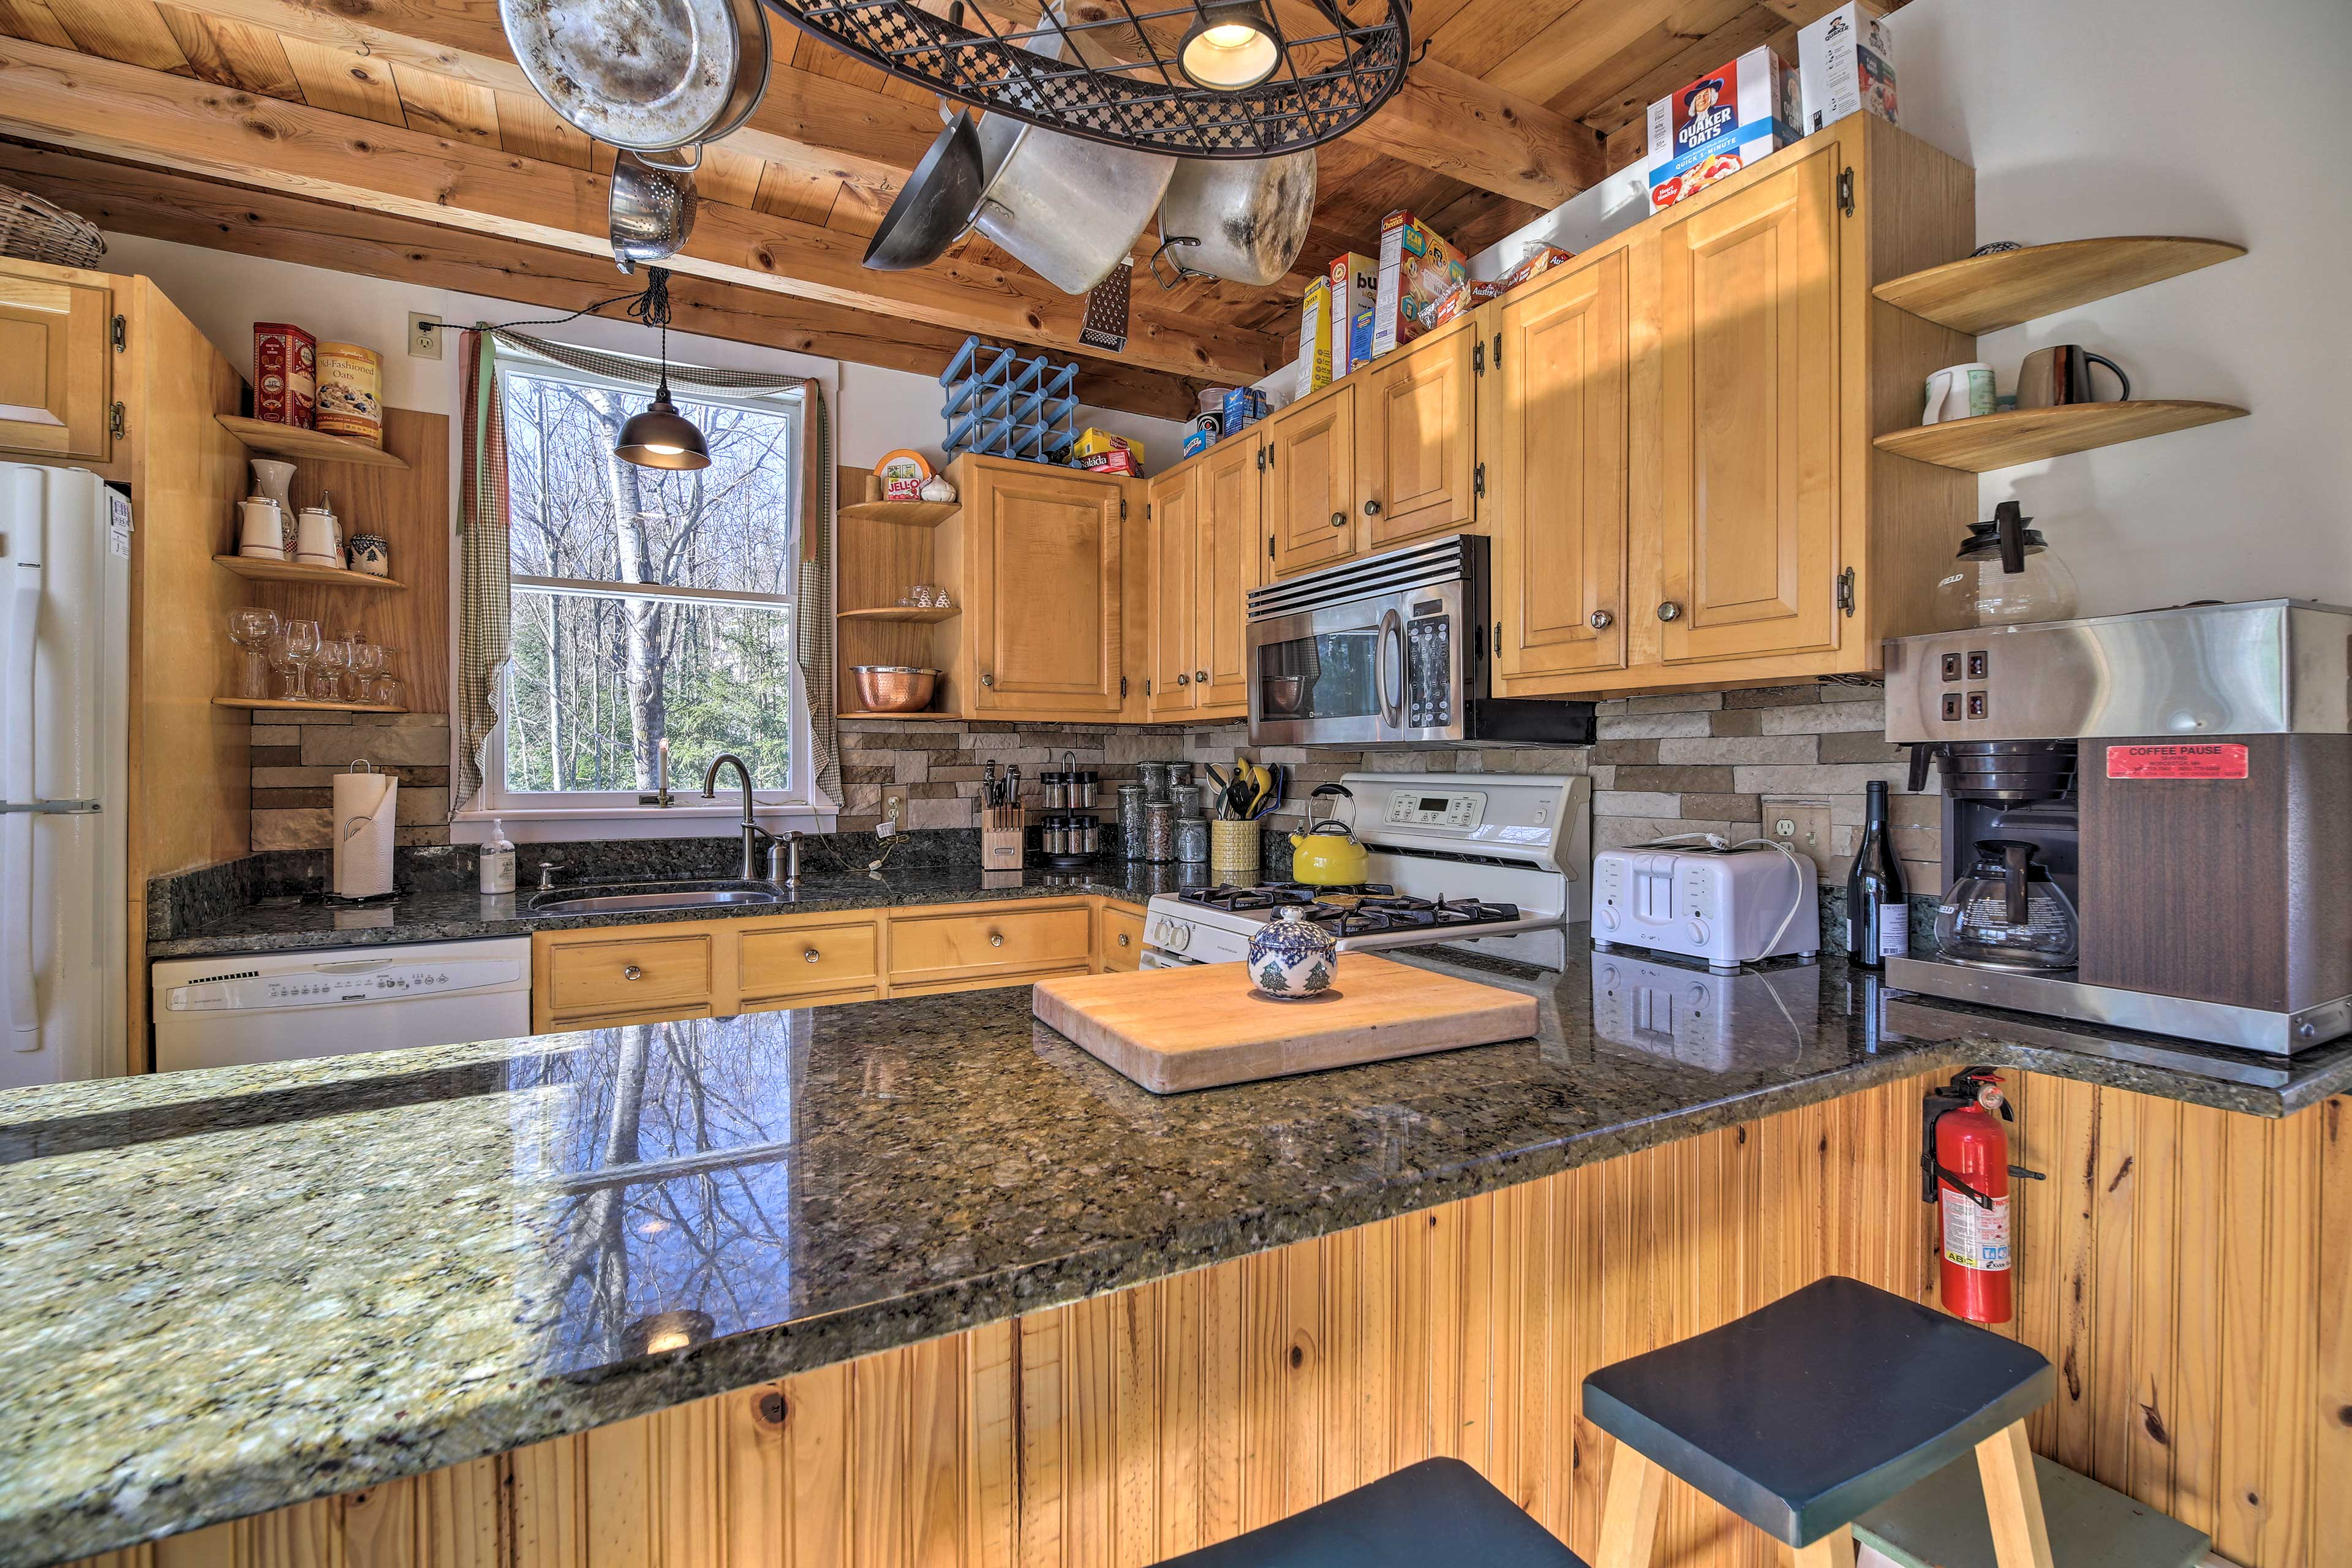 The kitchen boasts granite counters.